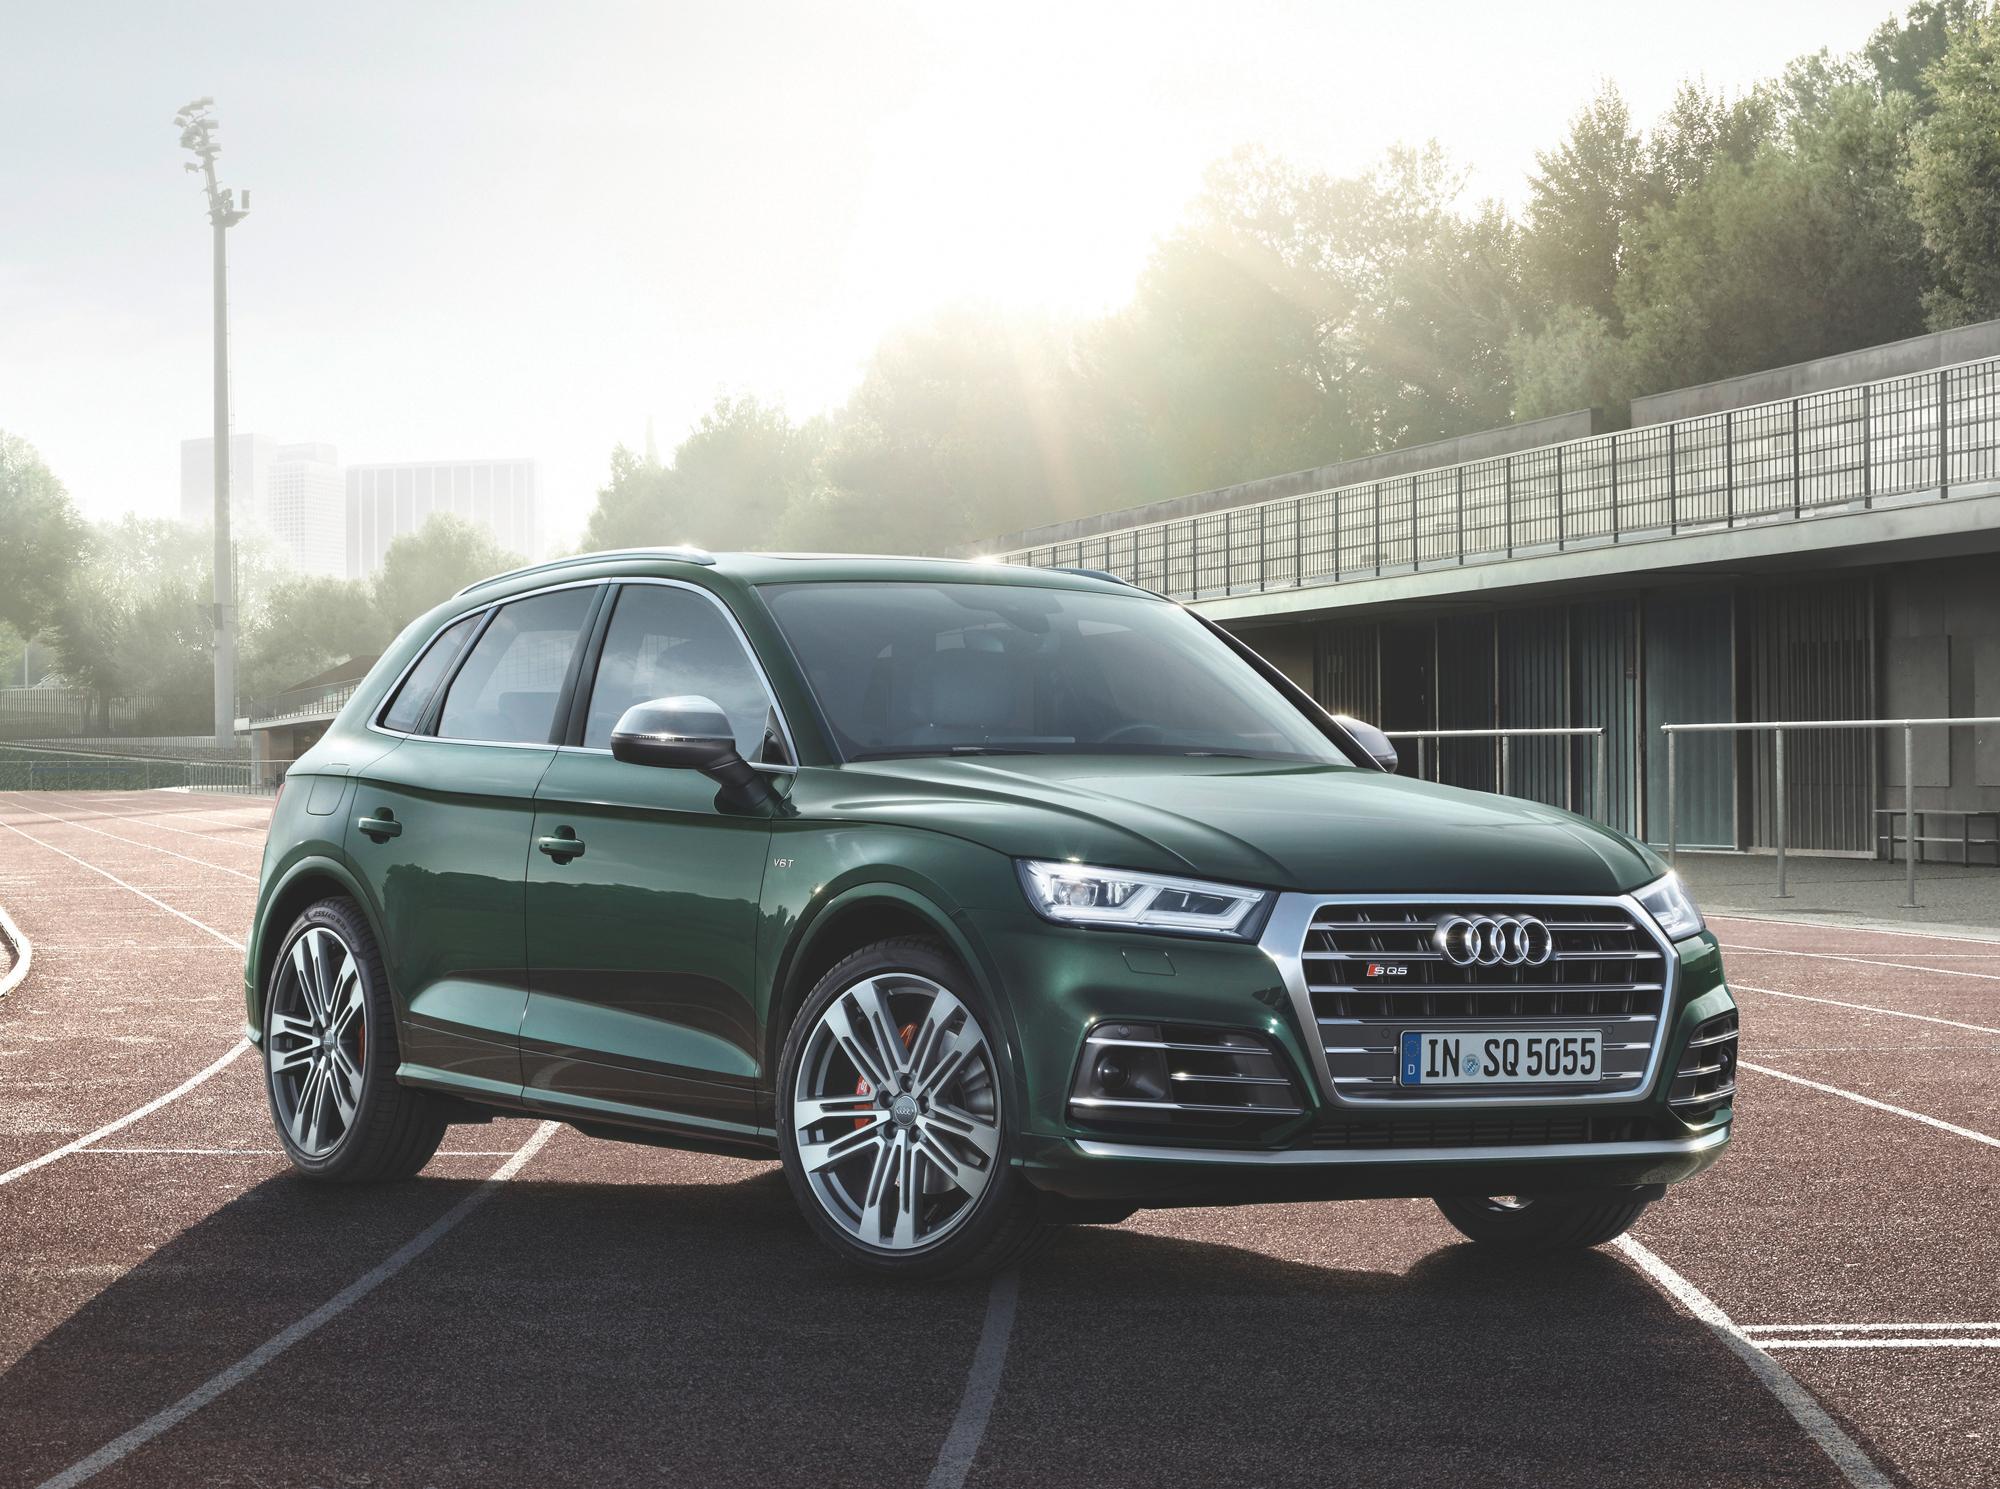 062 Audi SQ.jpg